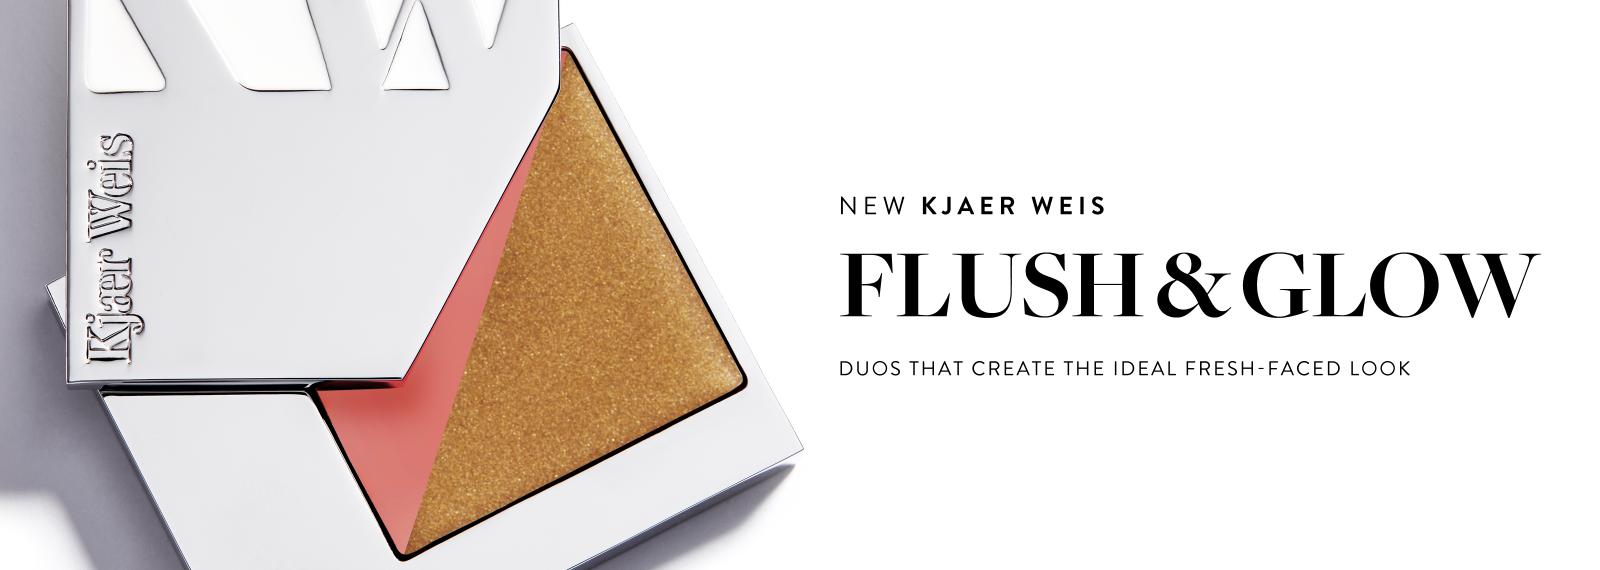 New - KJAER WEIS - Flush & Glow